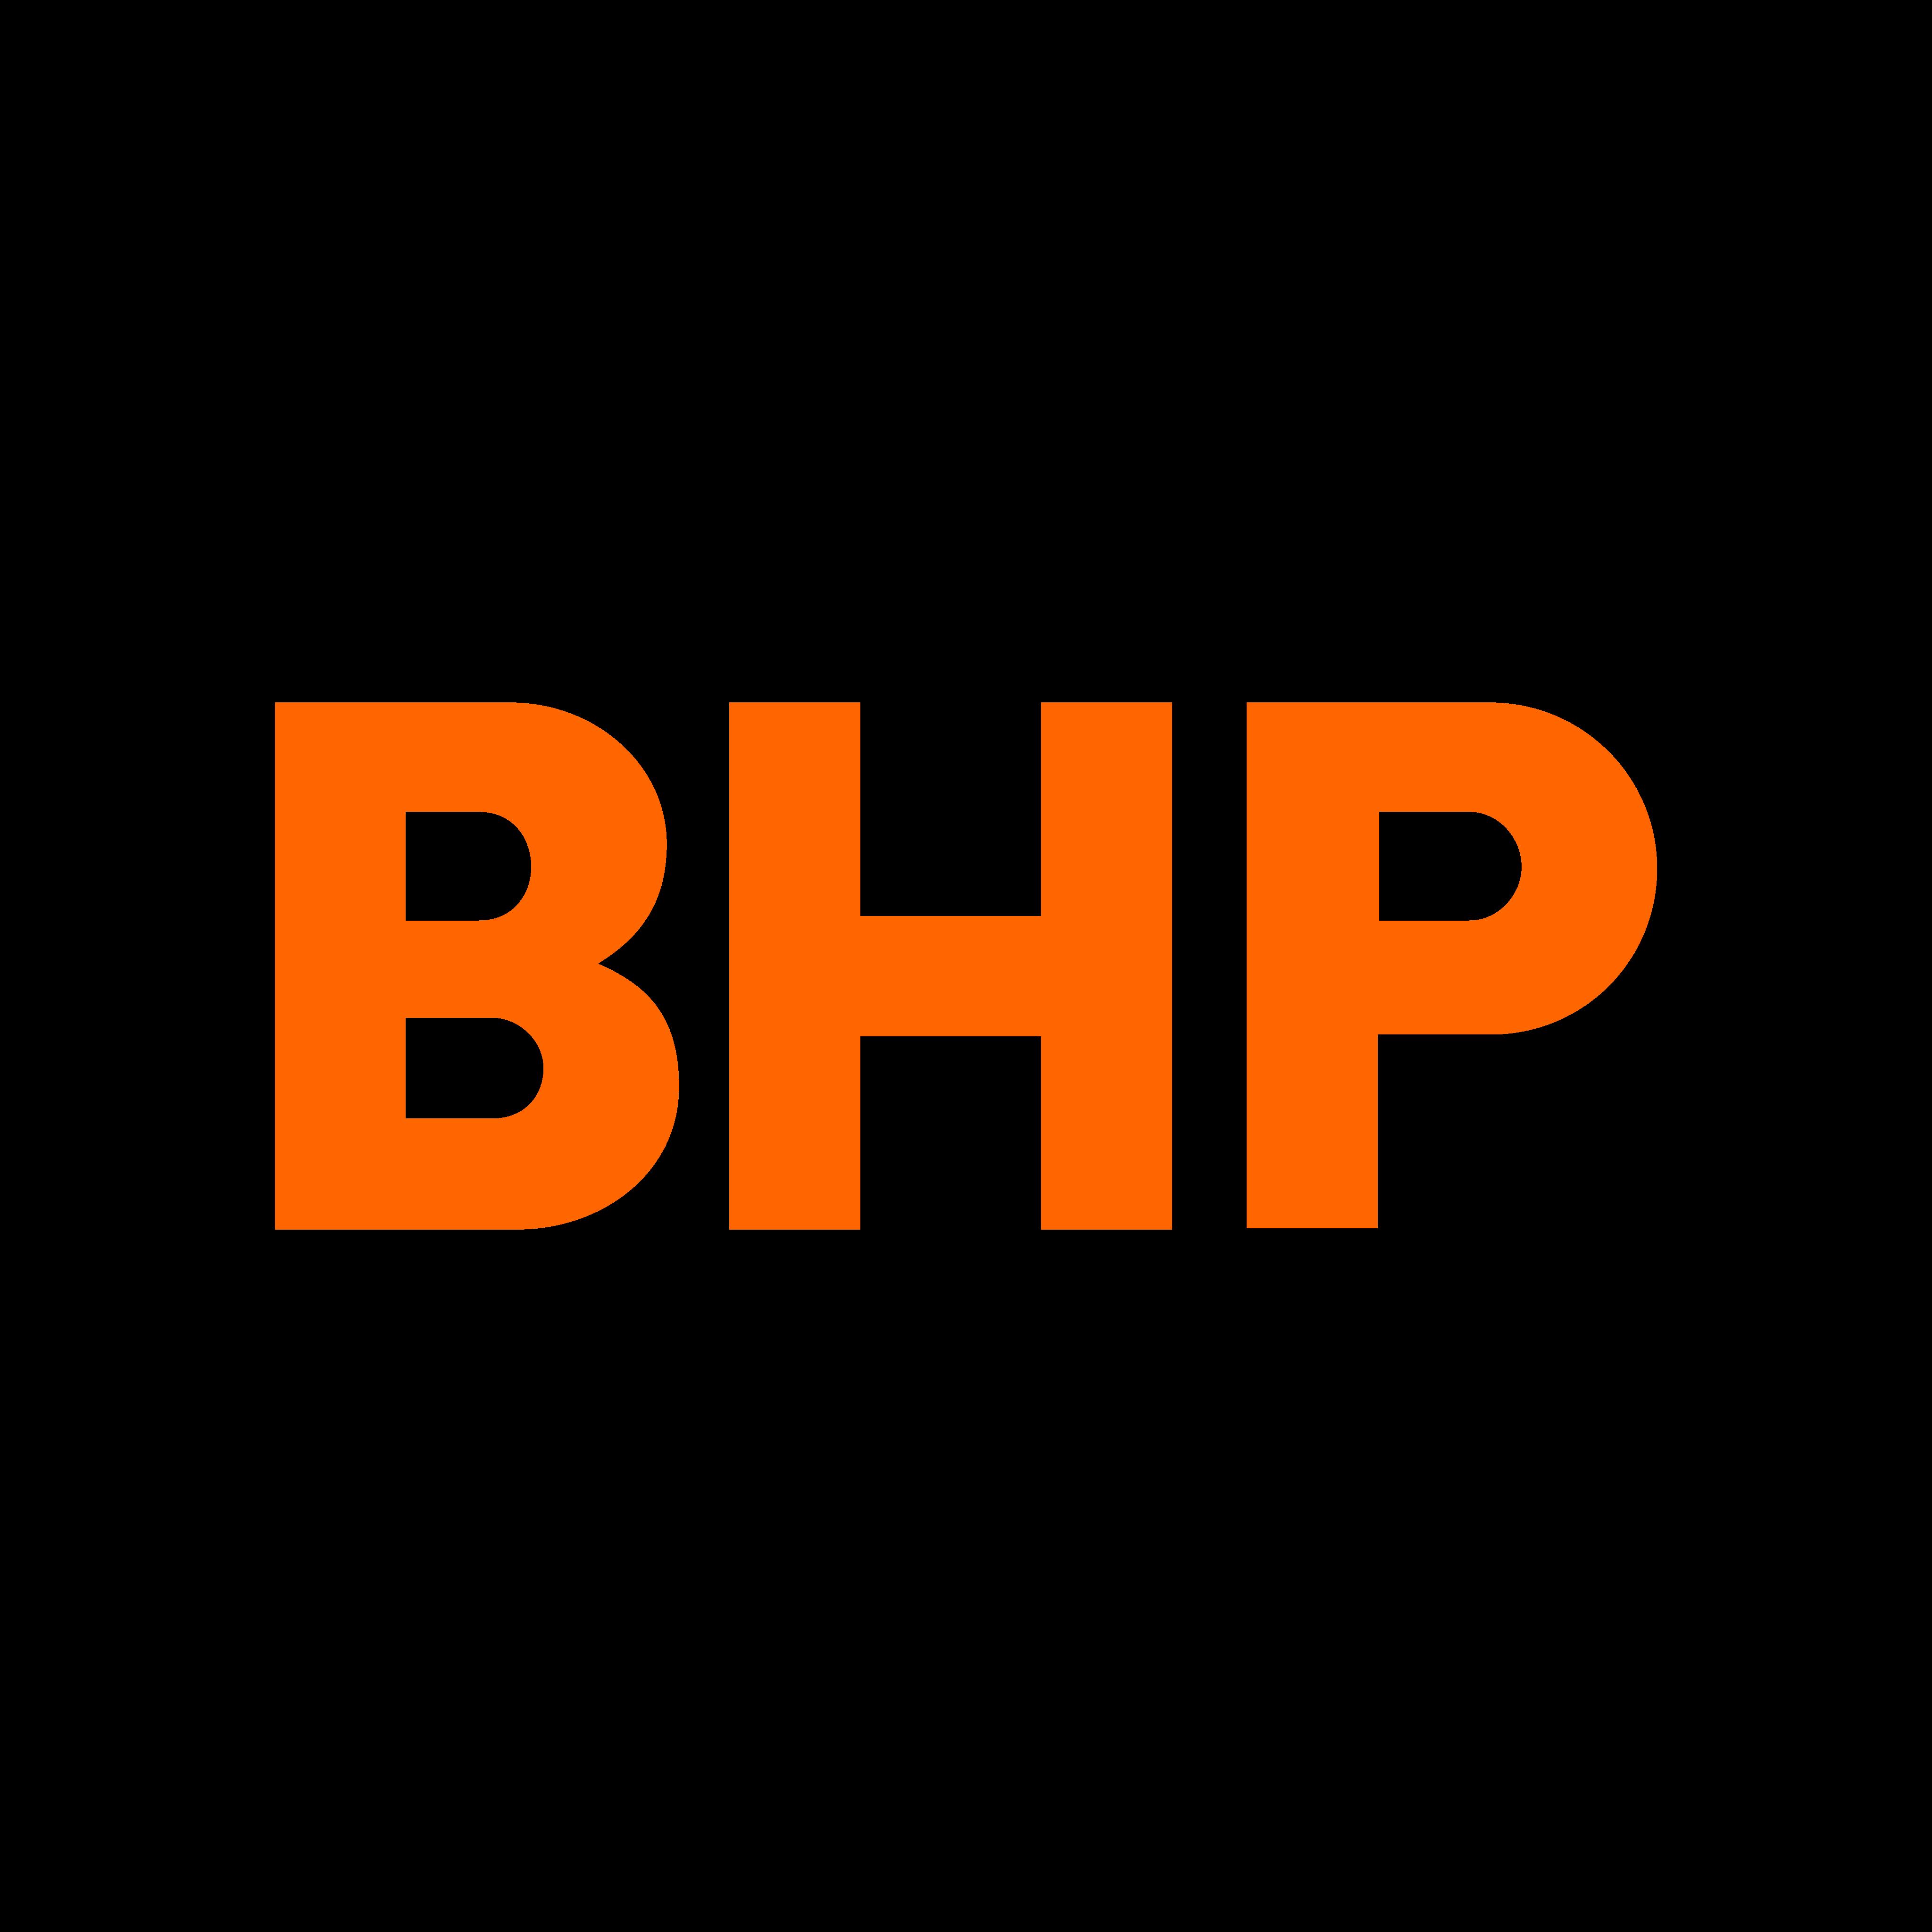 bhp logo 0 - BHP Logo